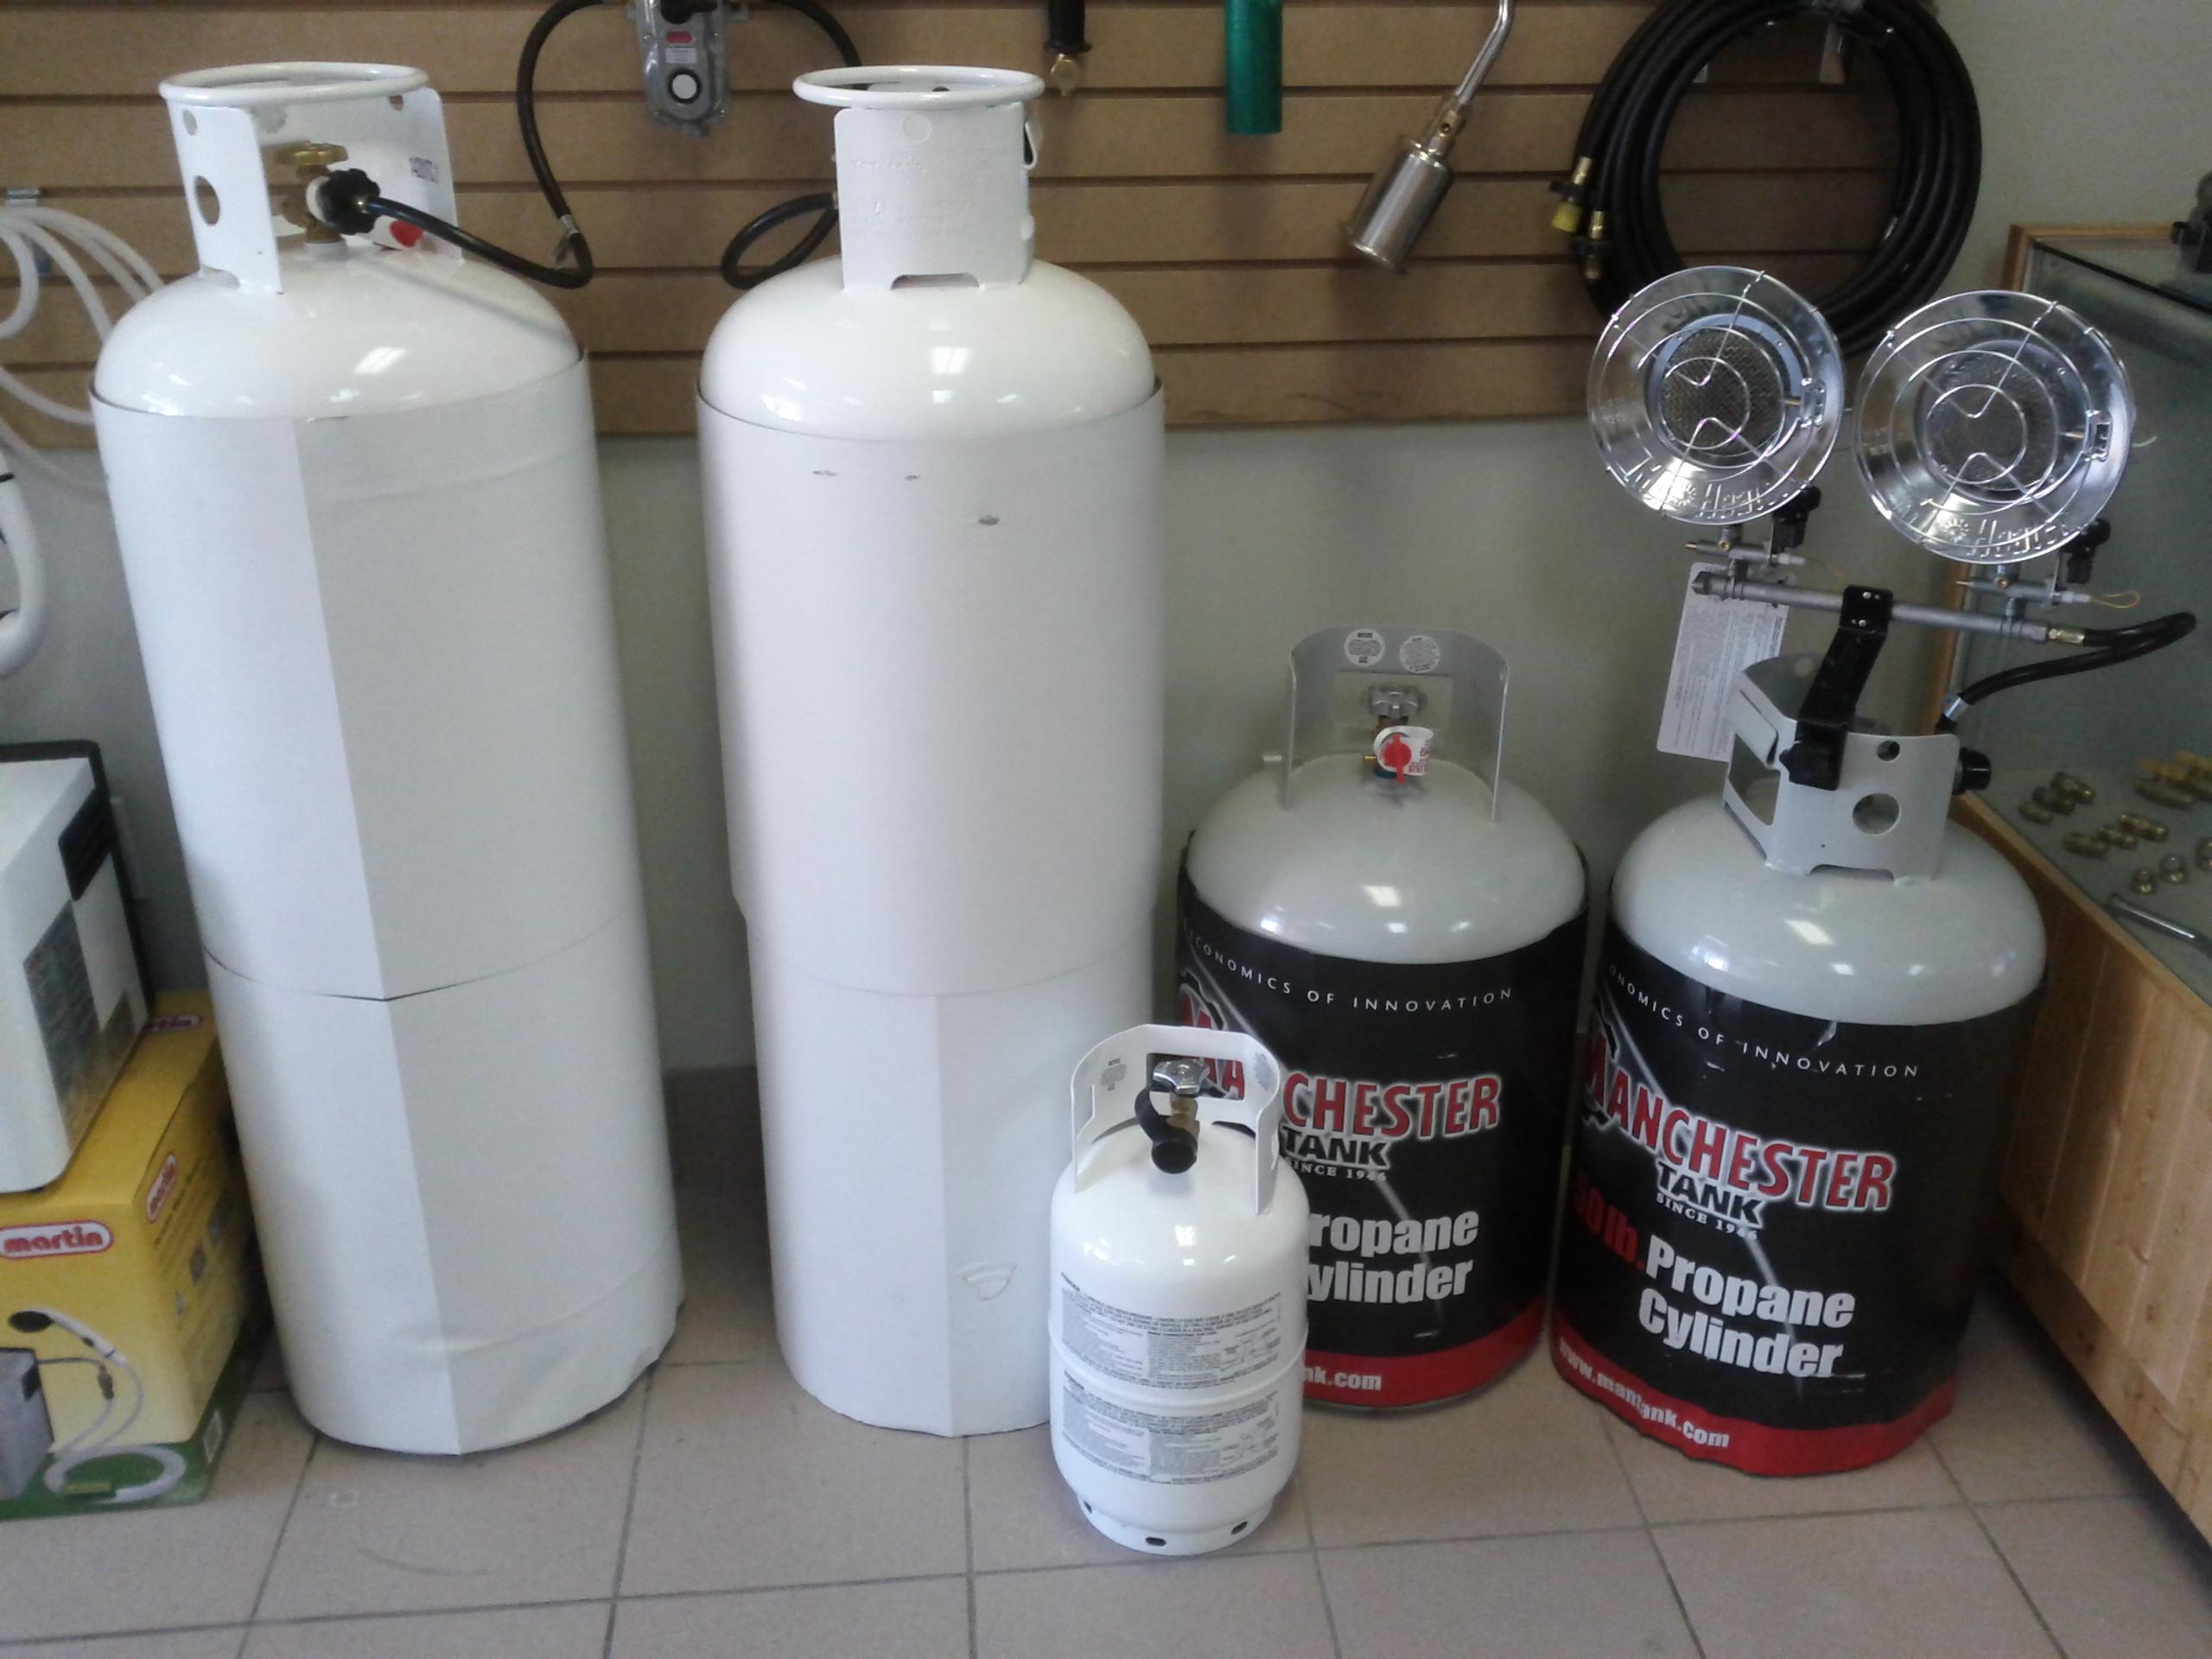 Bonbonne for Chauffe eau piscine propane